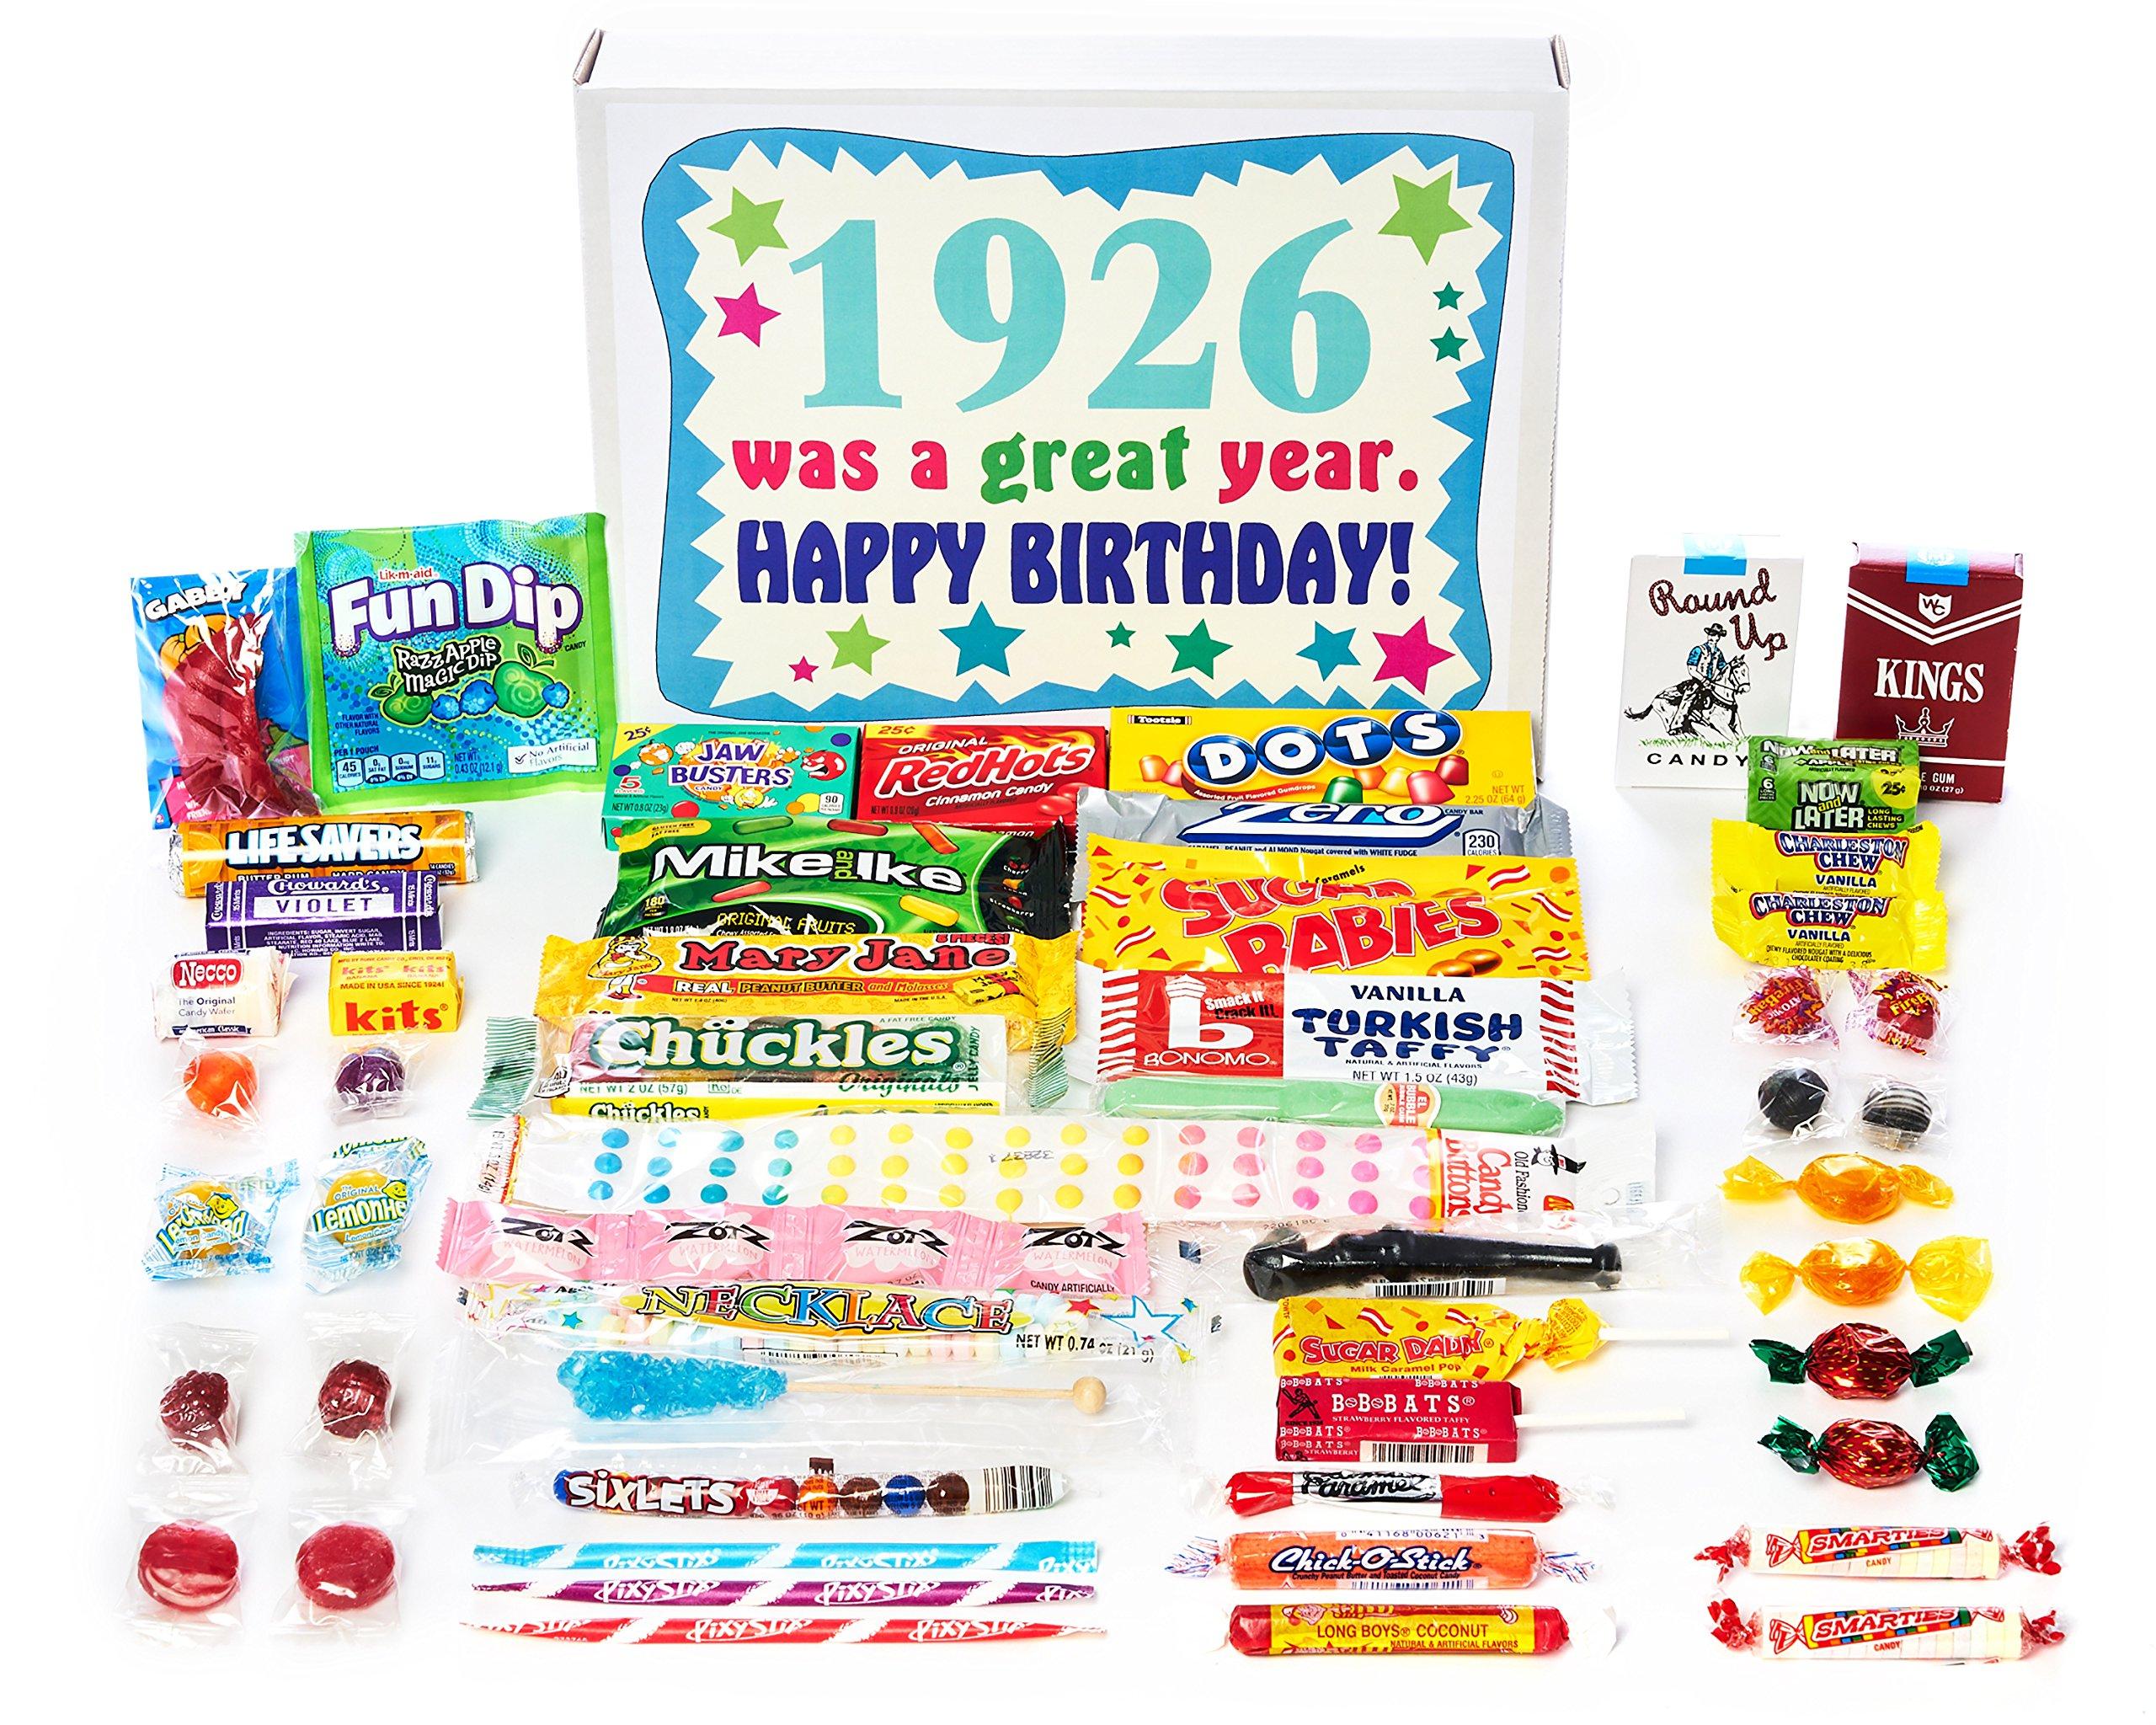 91st Birthday Amazon